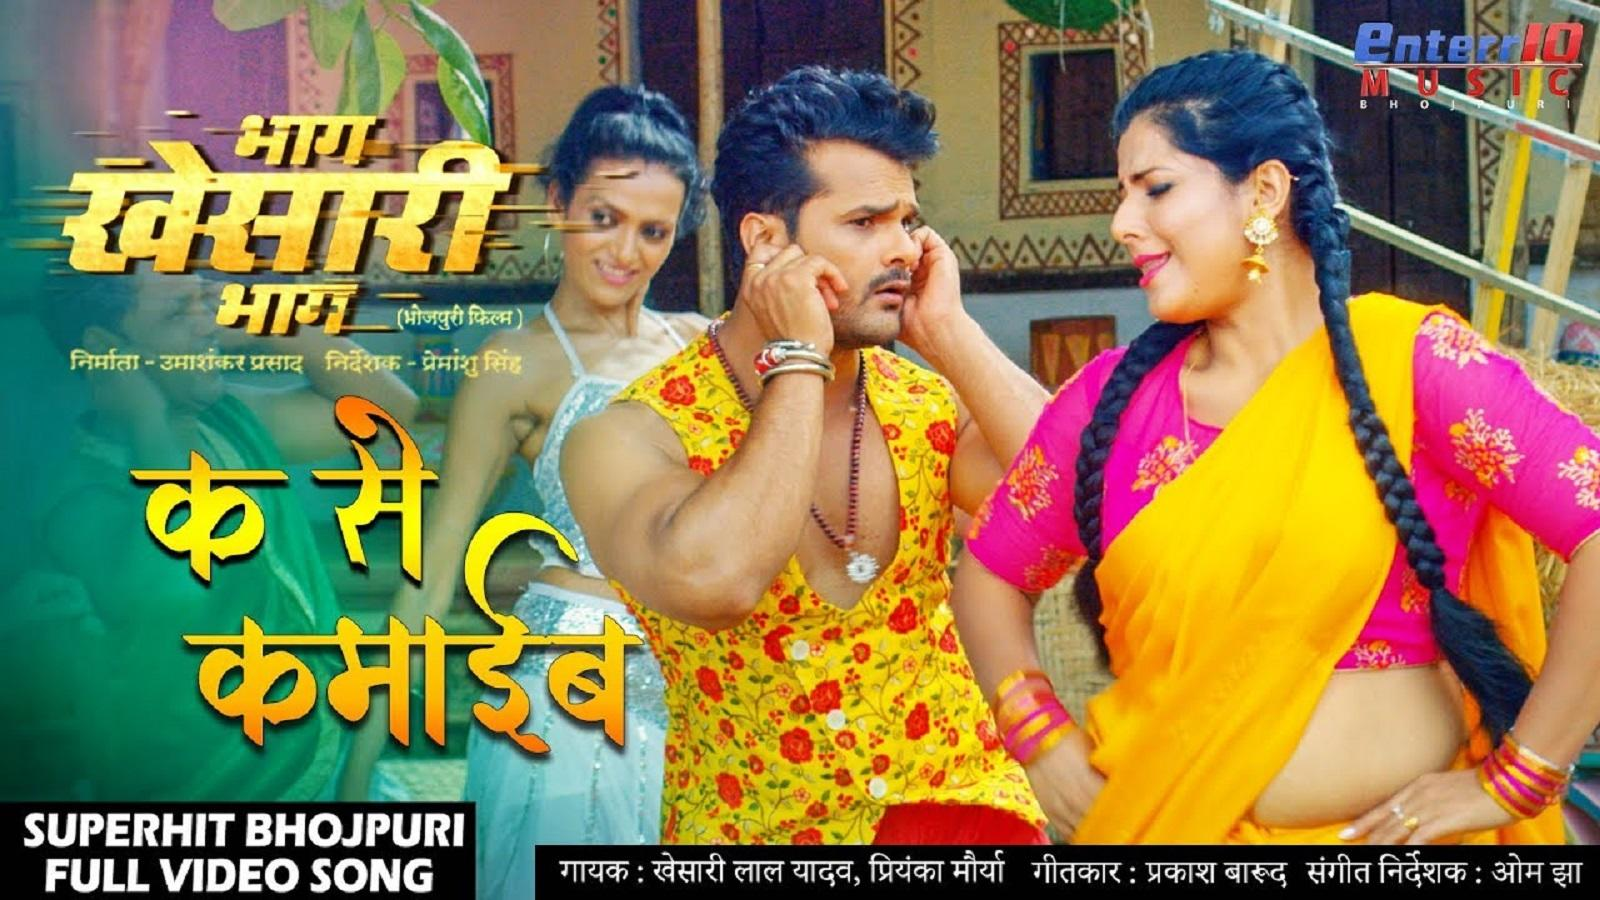 Khesari New Bhojpuri Song Video 2020: Khesari Lal Yadav and Smriti Sinha's  Latest Bhojpuri Gana 'Ka Se Kamaayib' from 'Bhag Khesari Bhag'